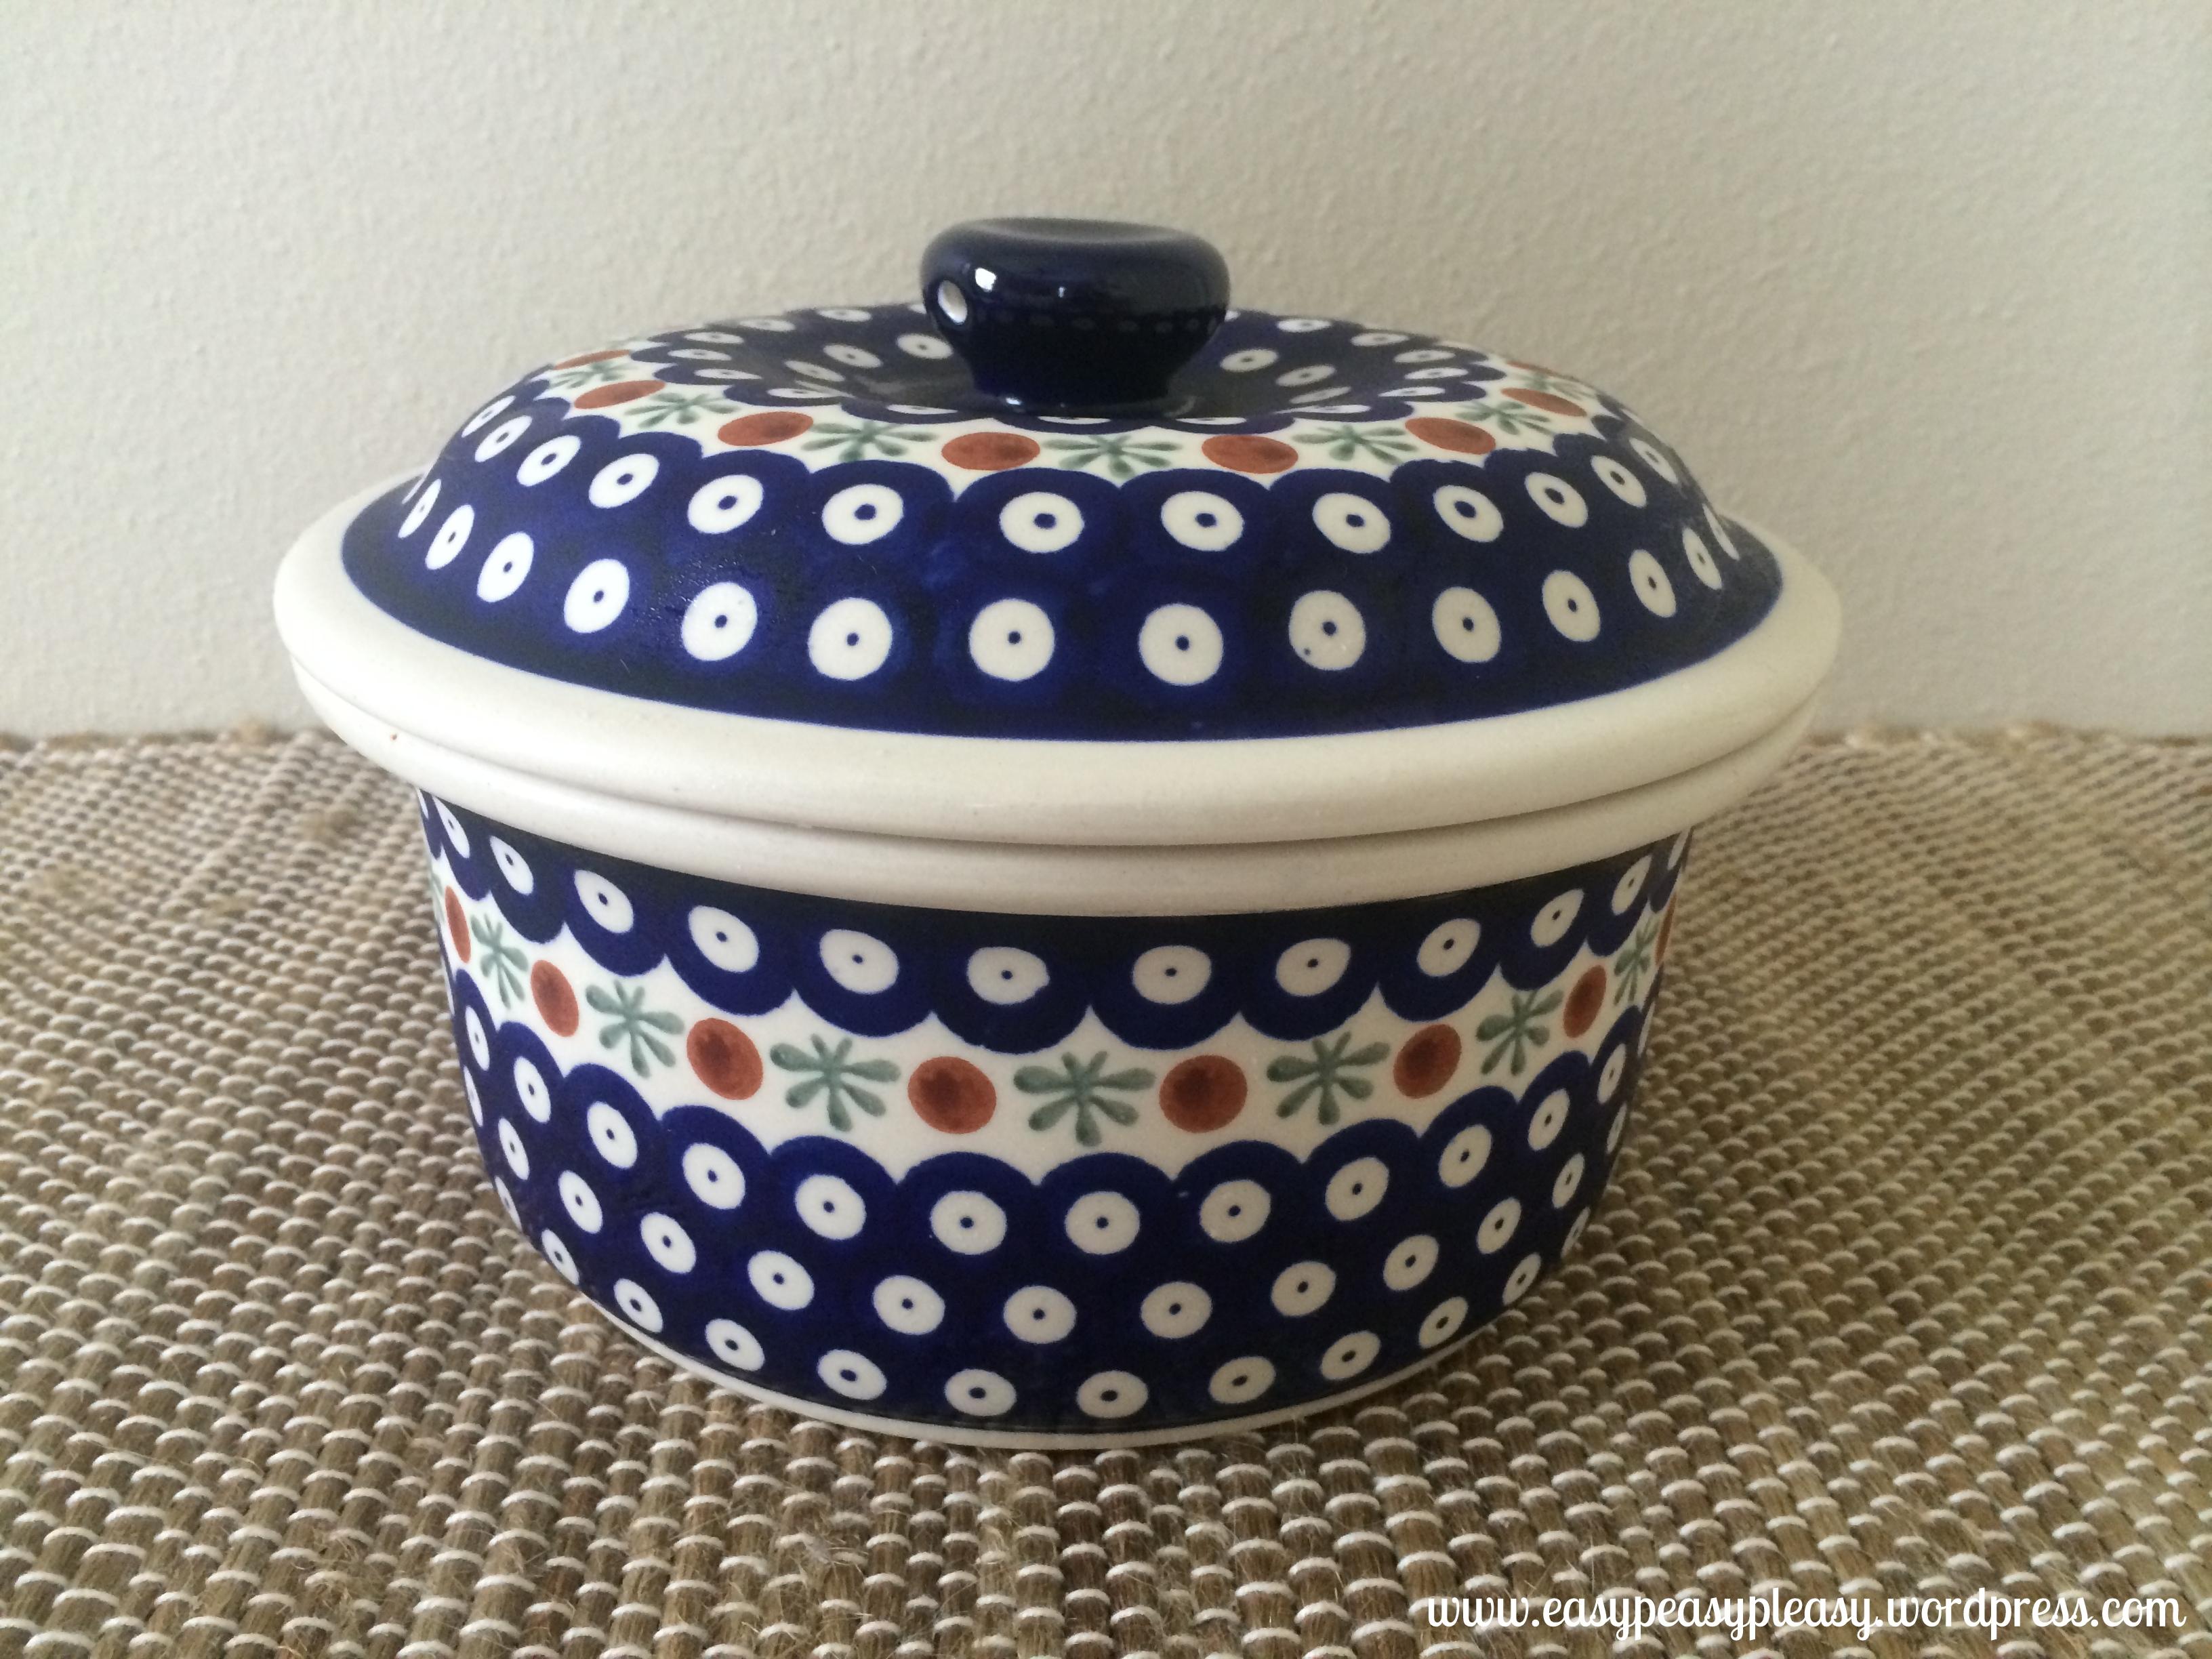 Polish Pottery Casserole Dish perfect size for corn tortilla